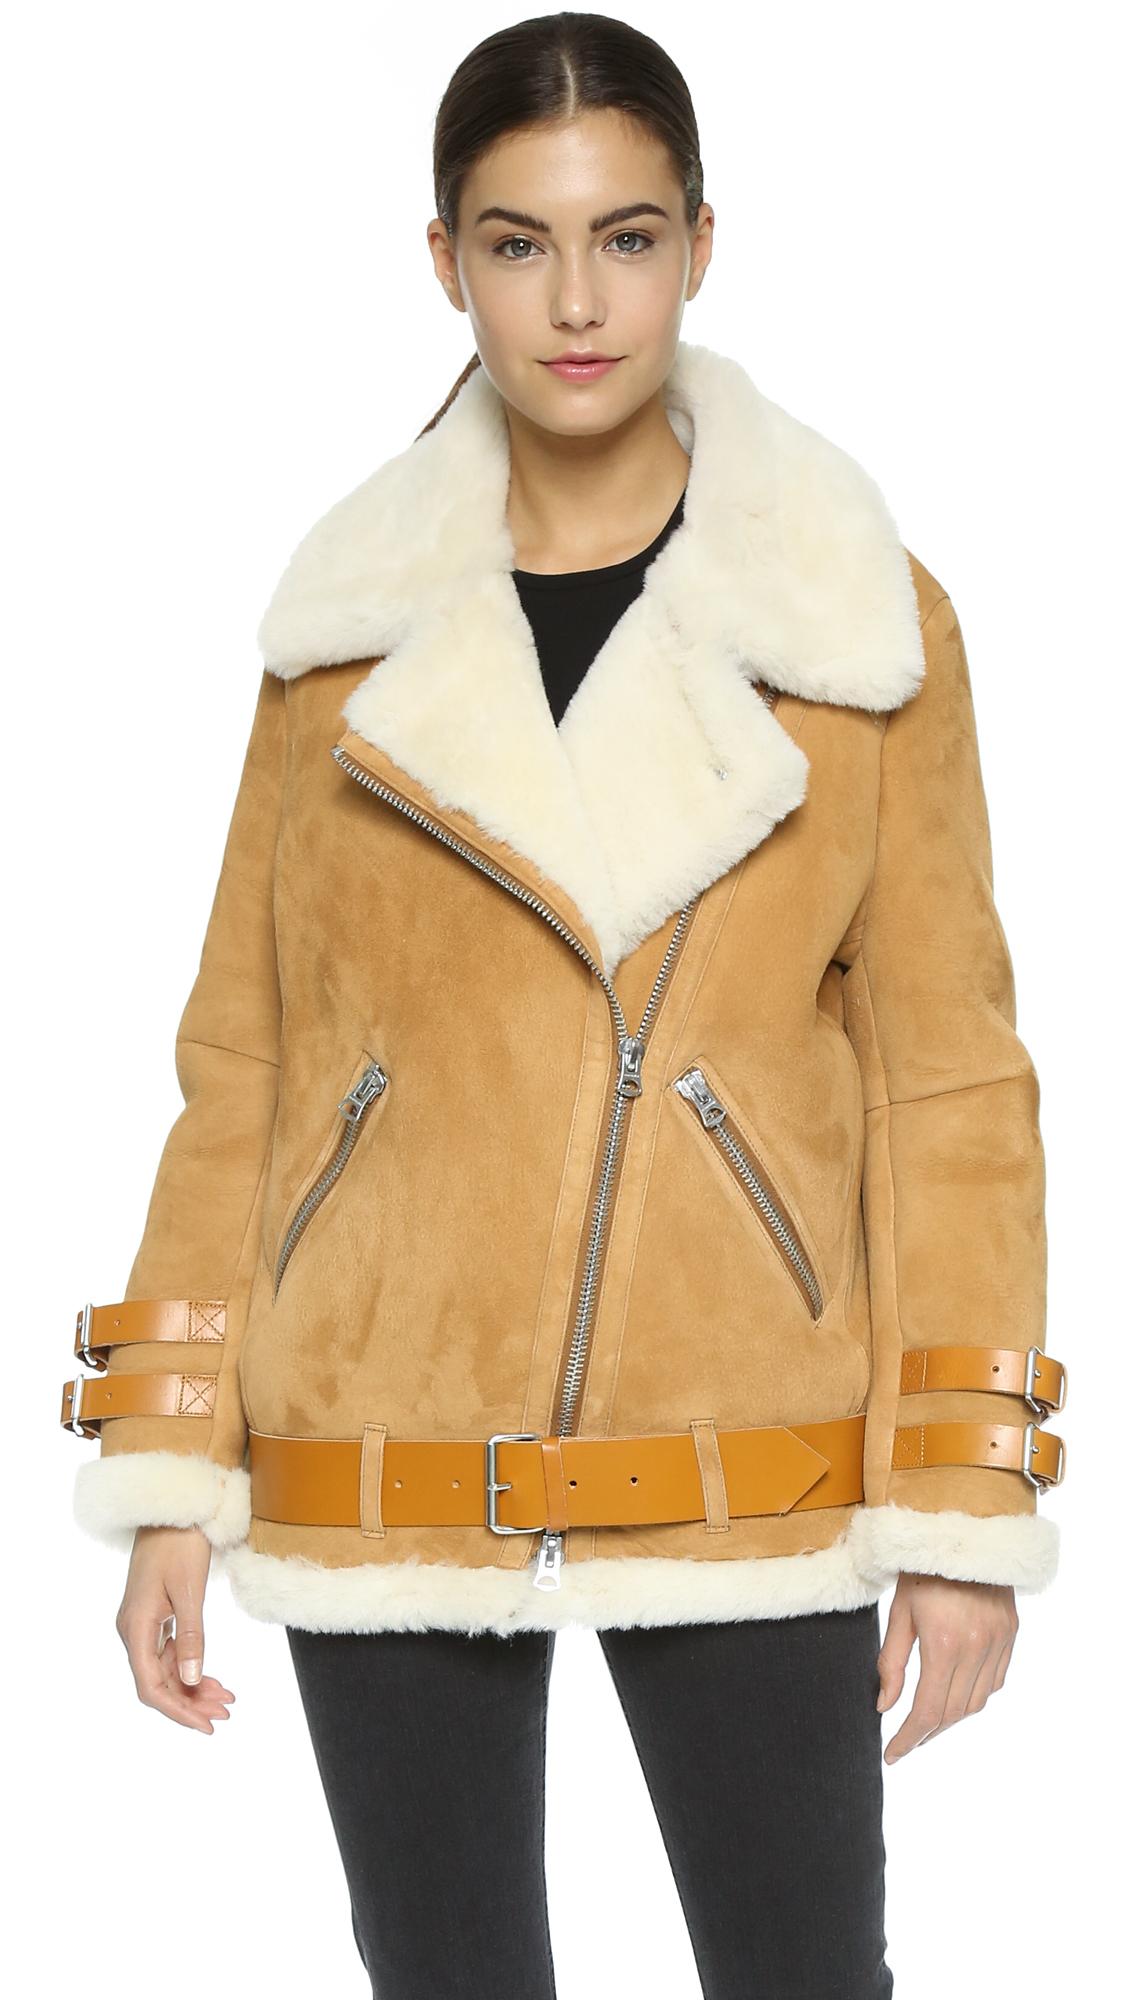 Acne studios Velocite Suede Shearling Moto Coat - Vintage Brown in ...